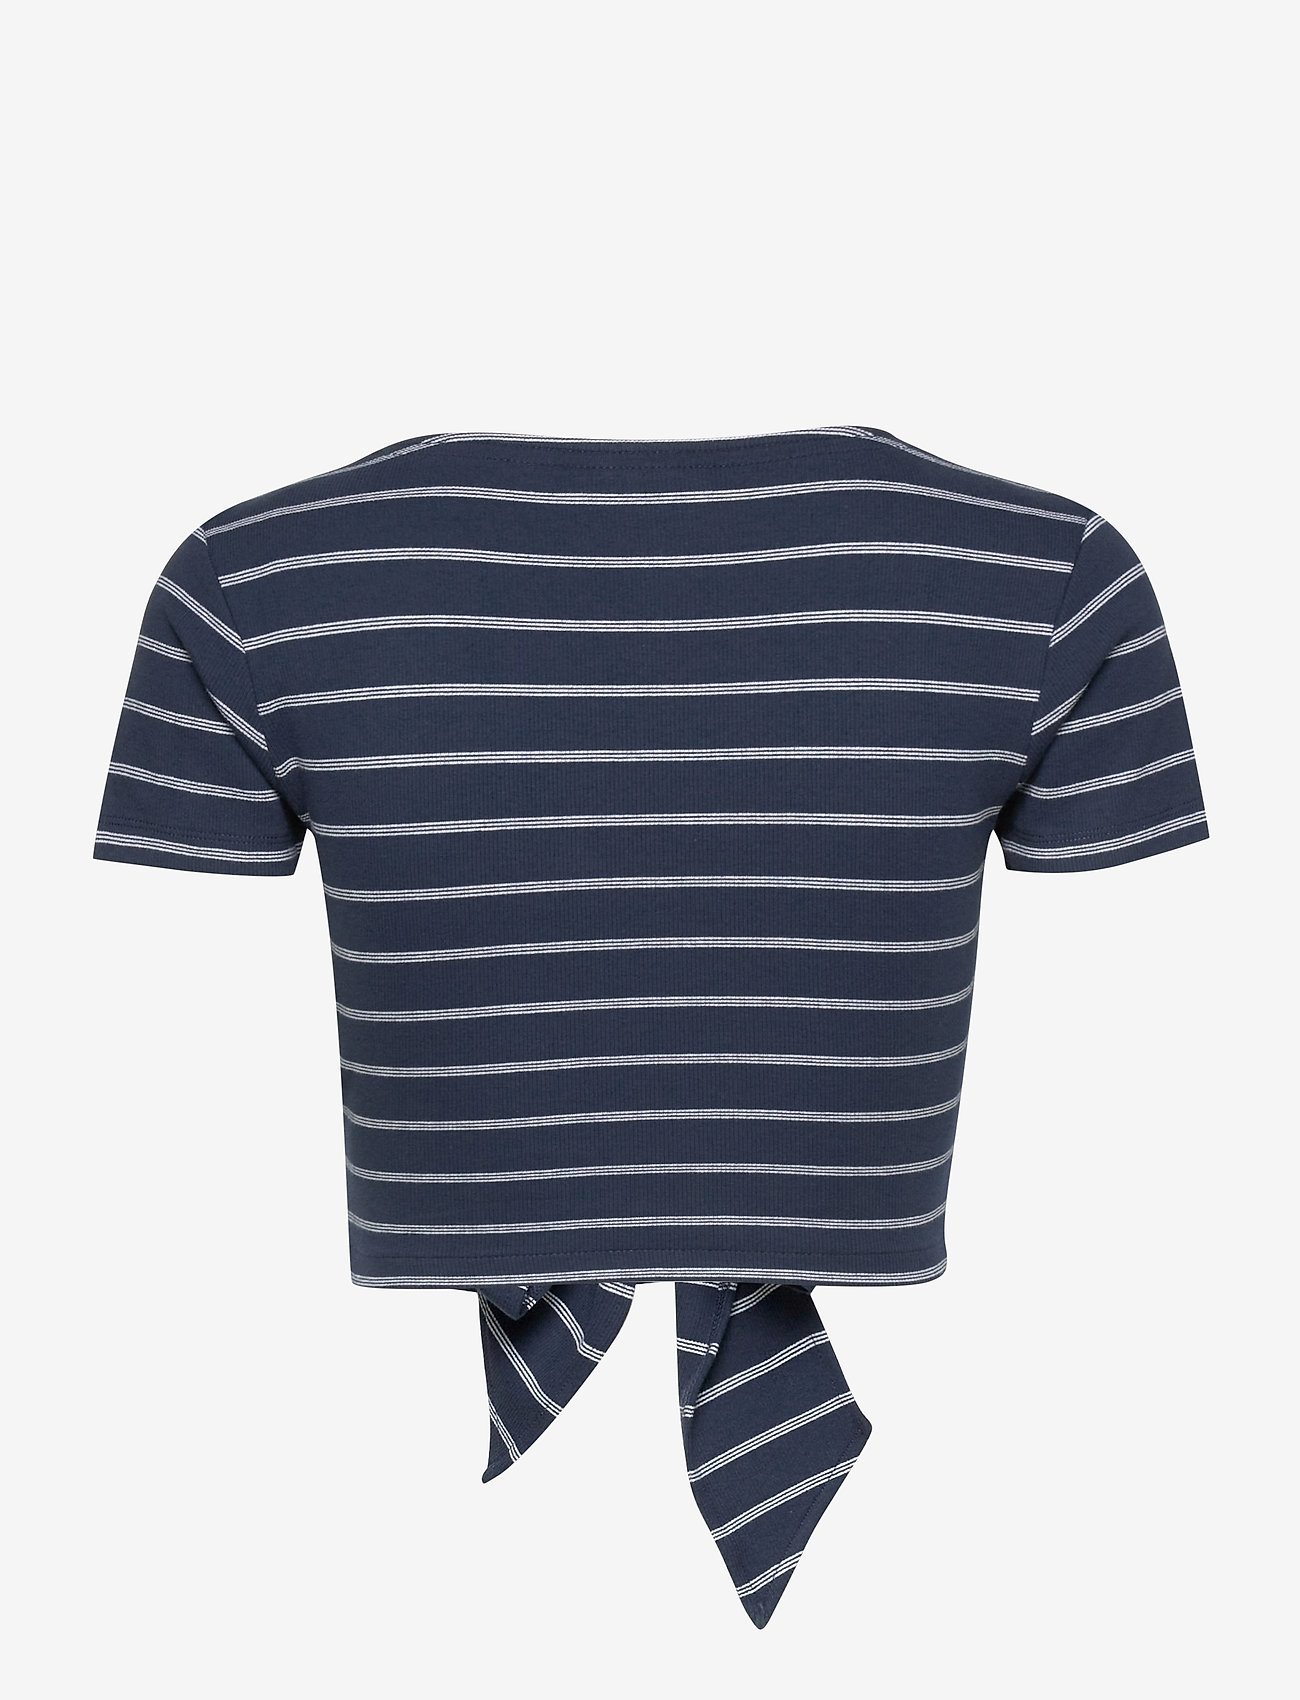 Tommy Jeans - TJW STRIPED WRAP TOP - crop tops - twilight navy / white stripe - 1